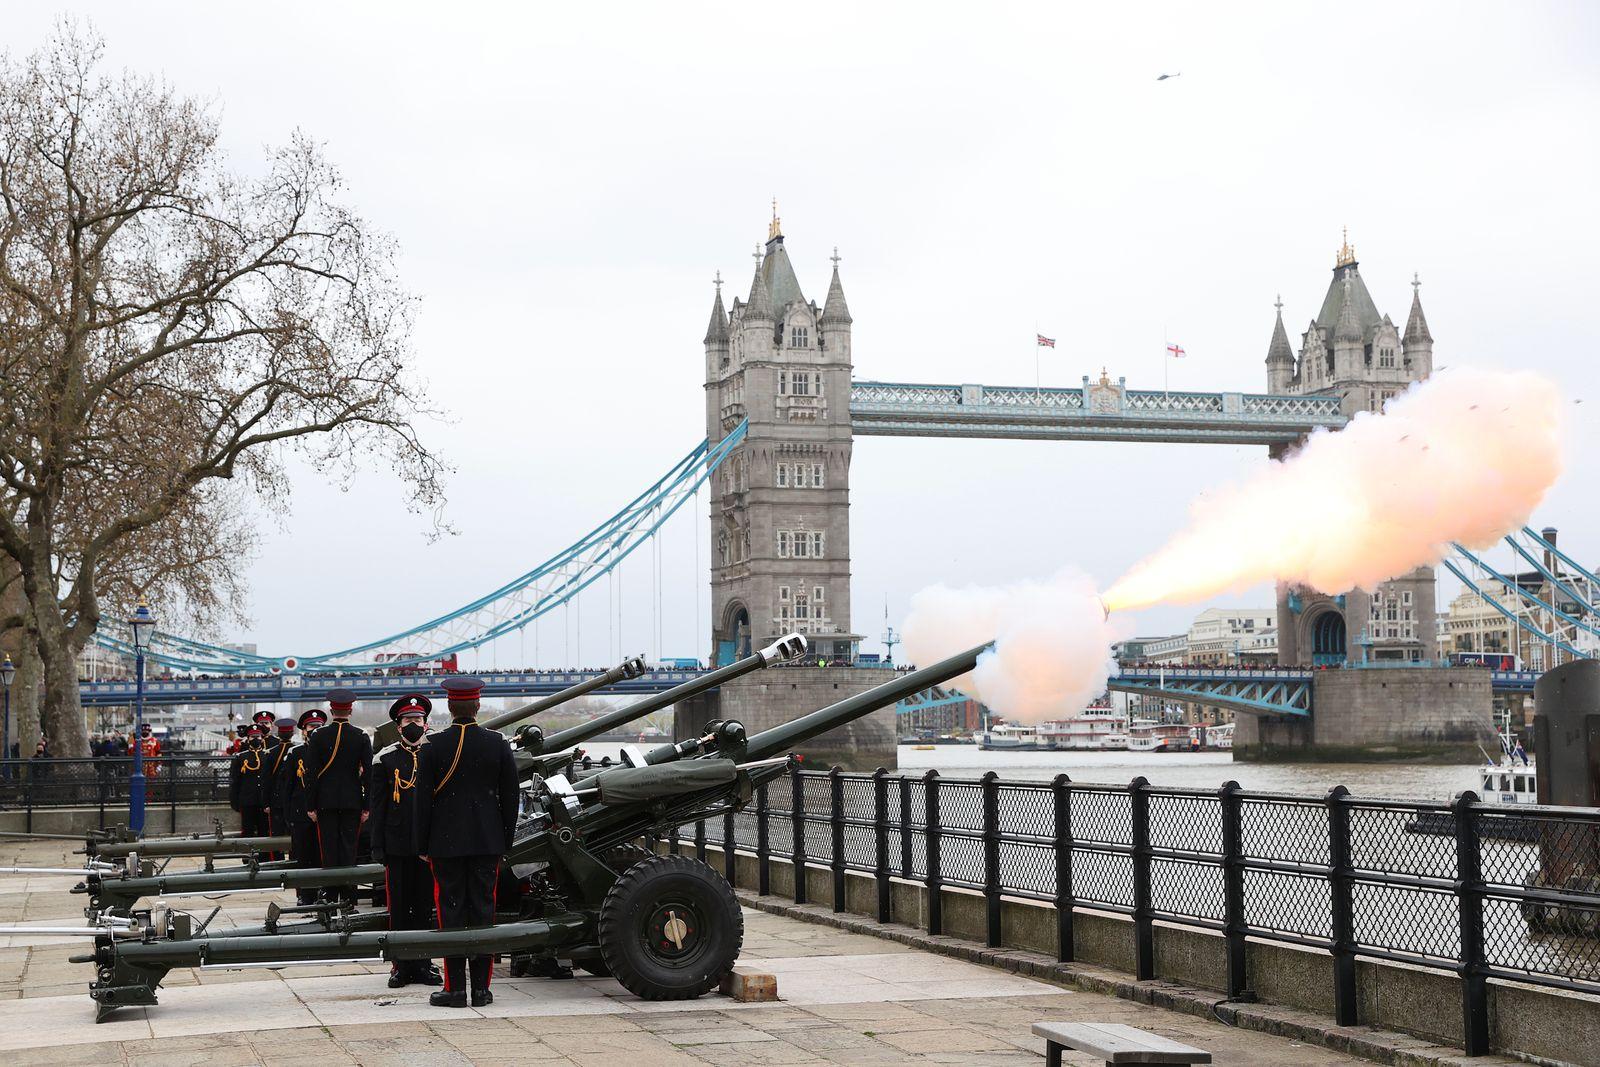 Historic Gun Salutes Mark The Passing Of His Royal Highness The Duke Of Edinburgh